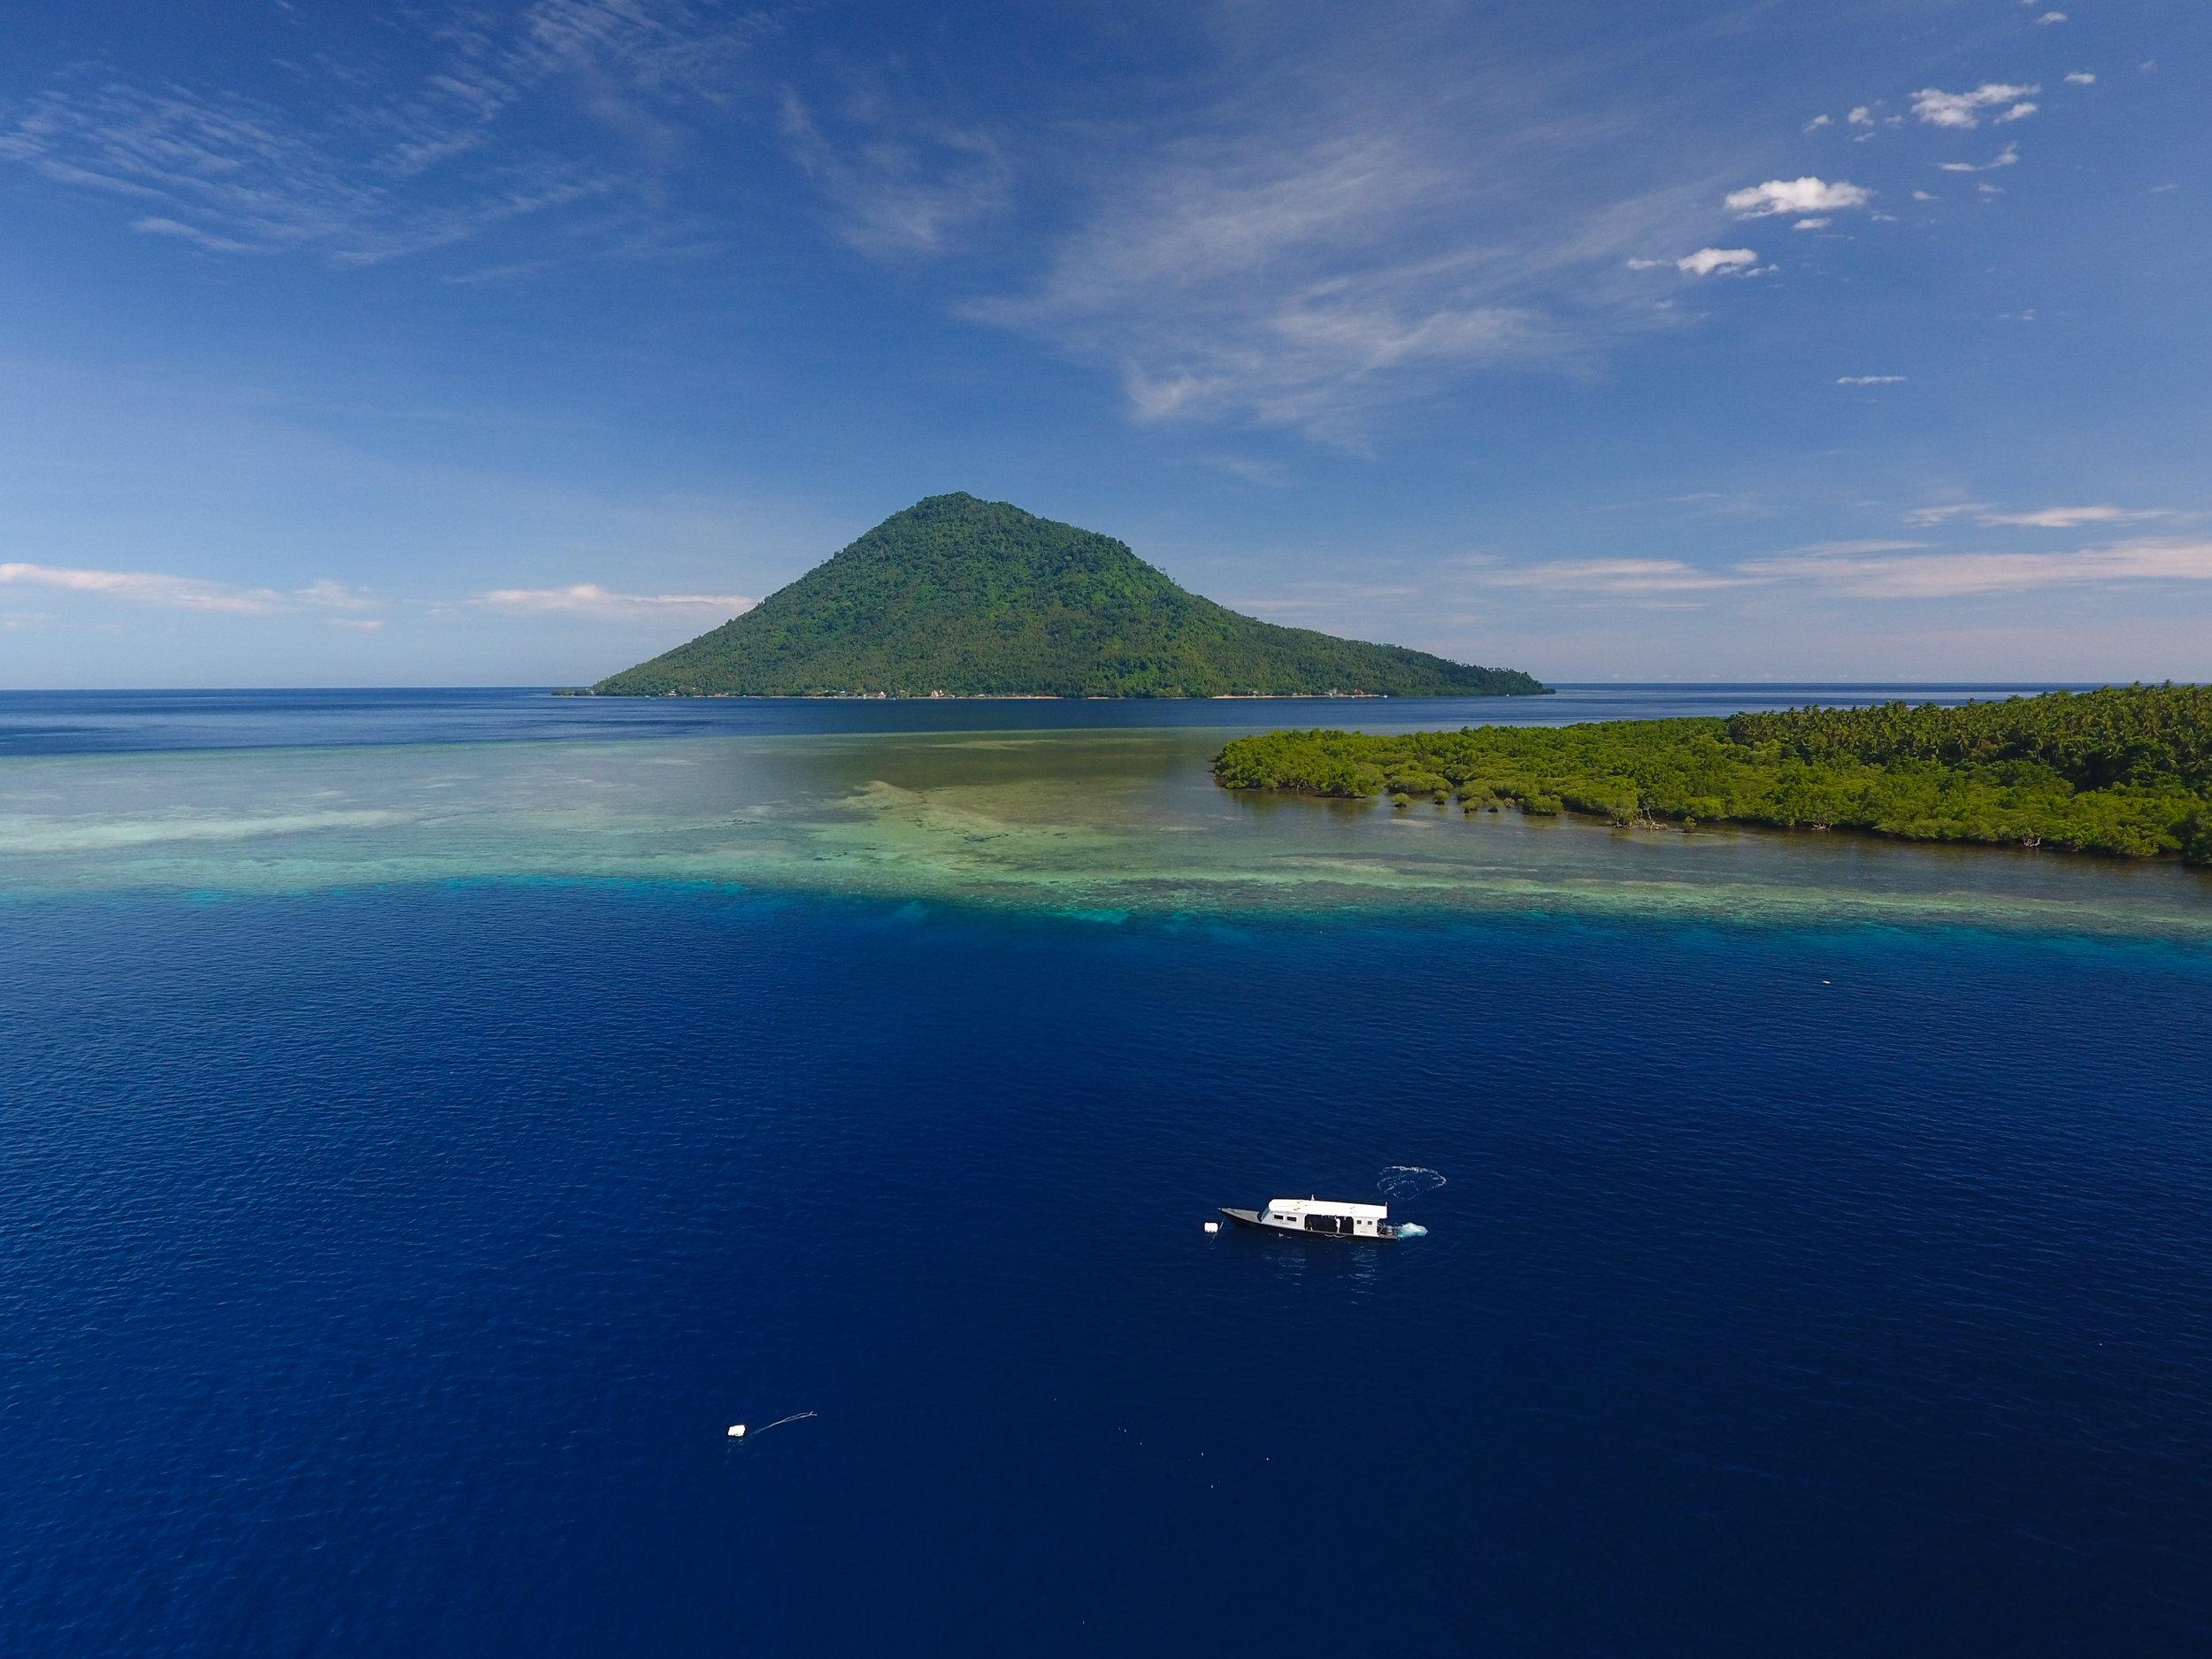 01 - the expedition team in the blue waters of bunaken CREDIT: The Ocean Agency / paul g. allen philanthropies